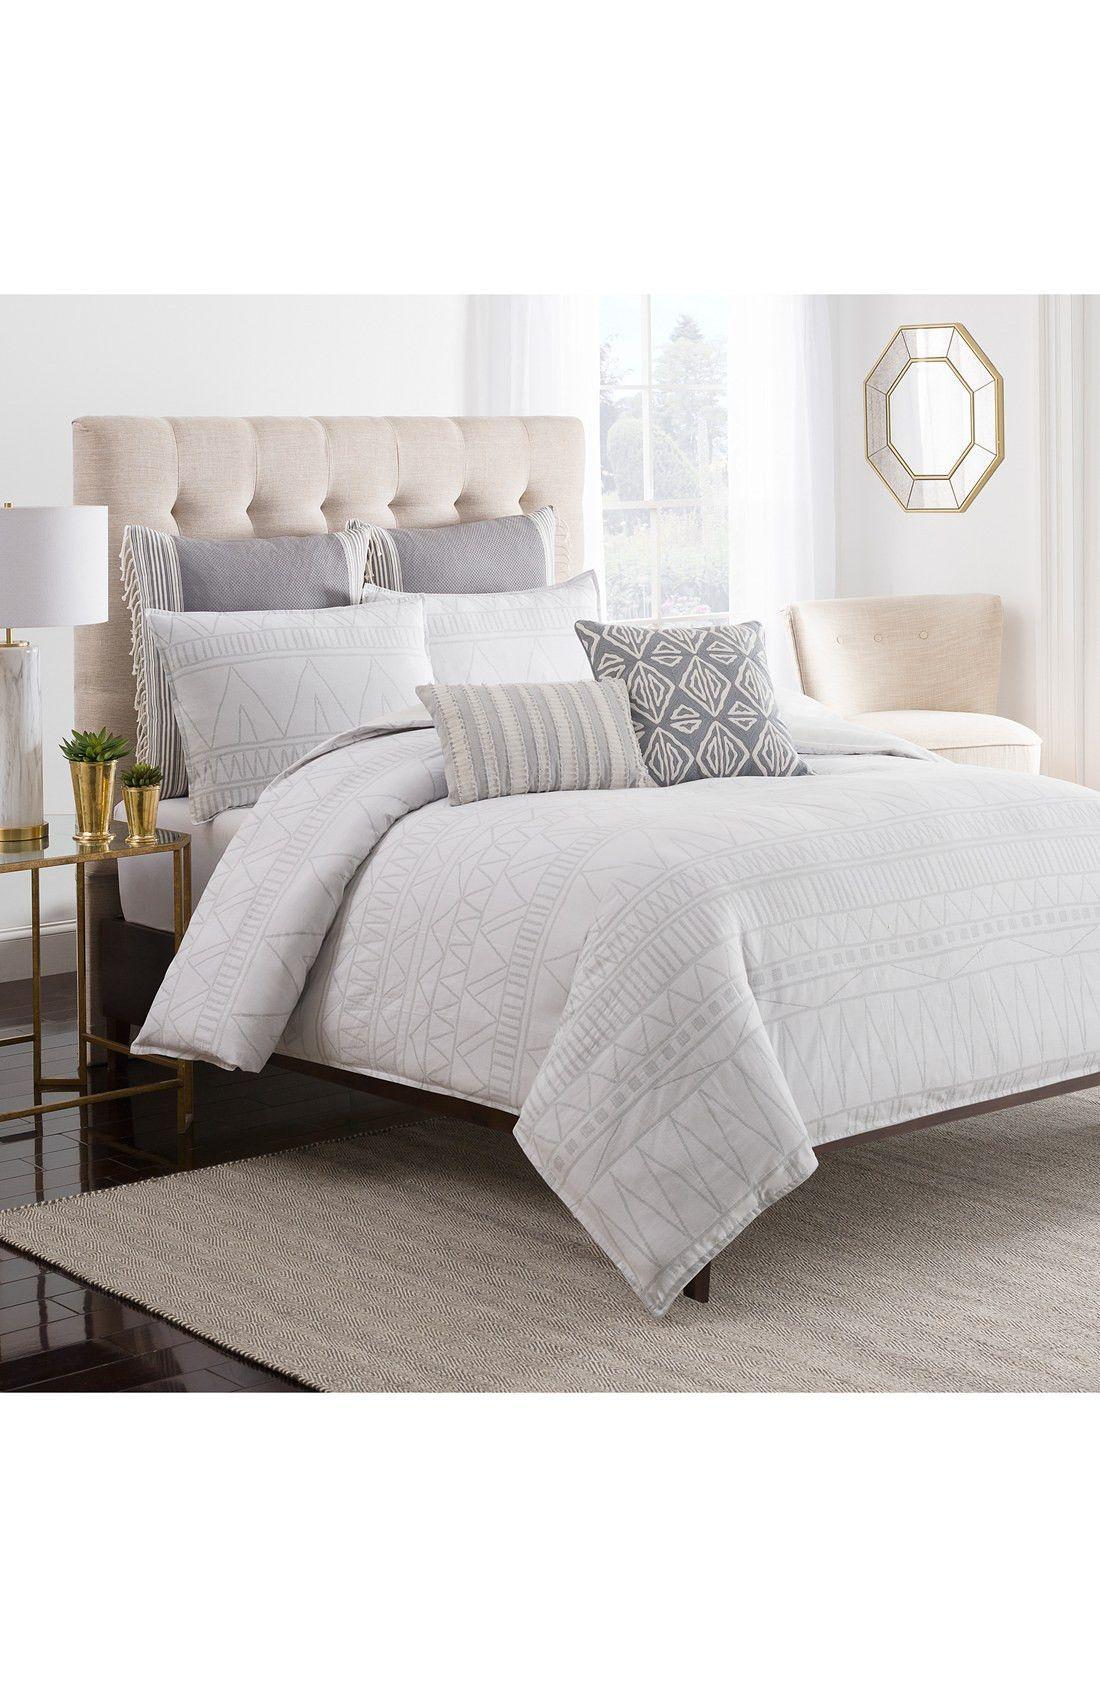 Matrimonio Bed Cover : Moroccan geo duvet cover bedroom ideas dormitorio de